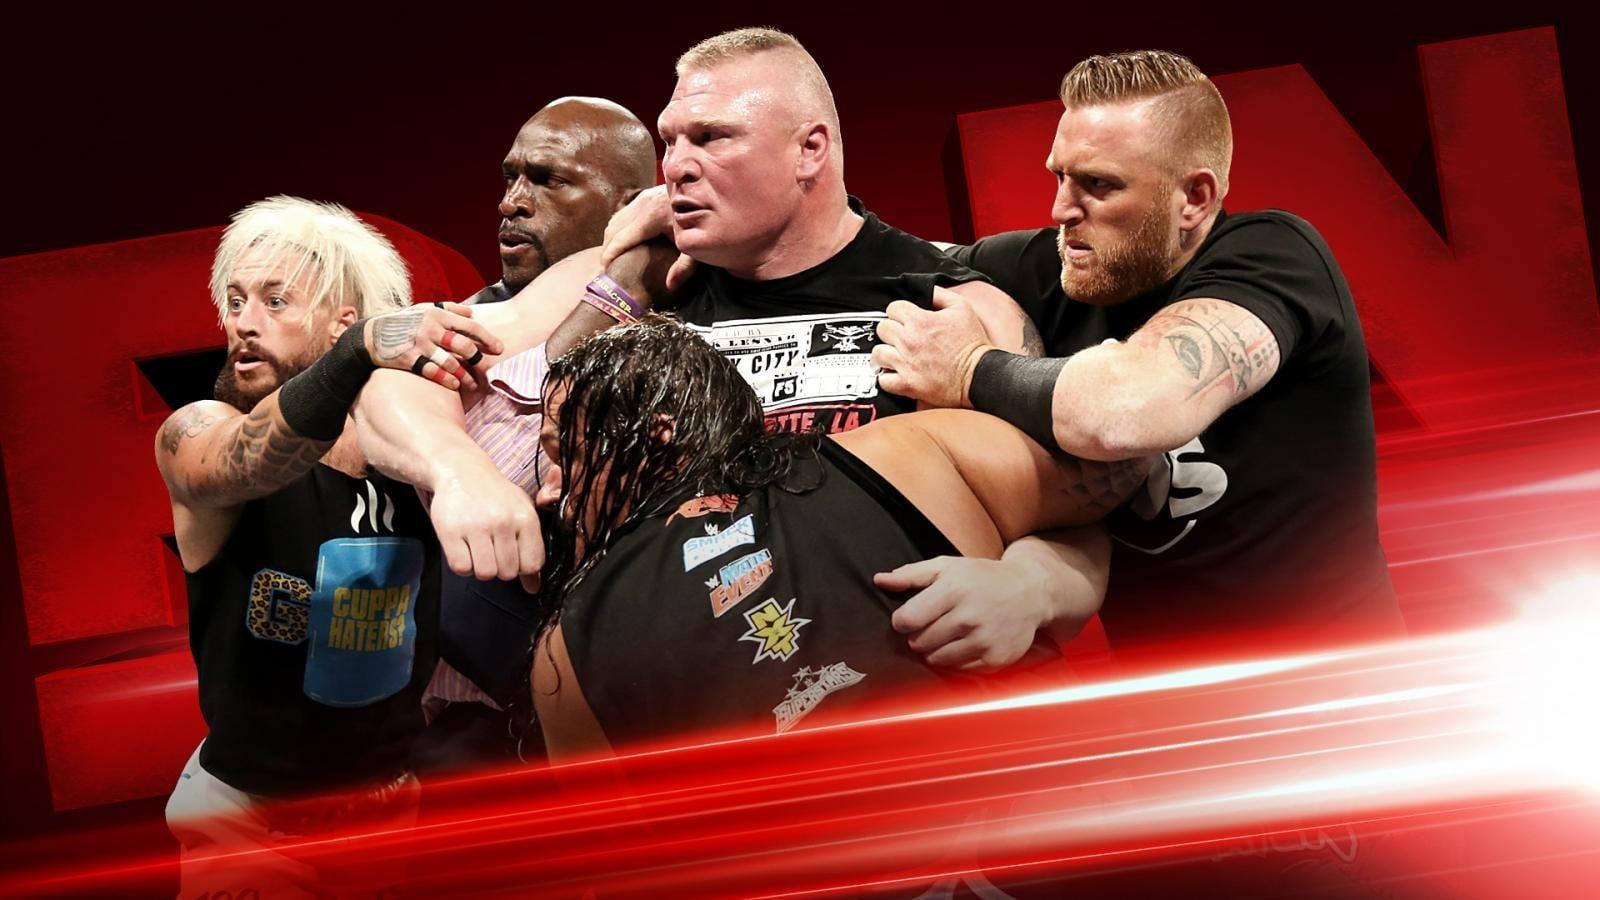 WWE Raw Season 25 :Episode 26  June 26, 2017  (Los Angeles, California)